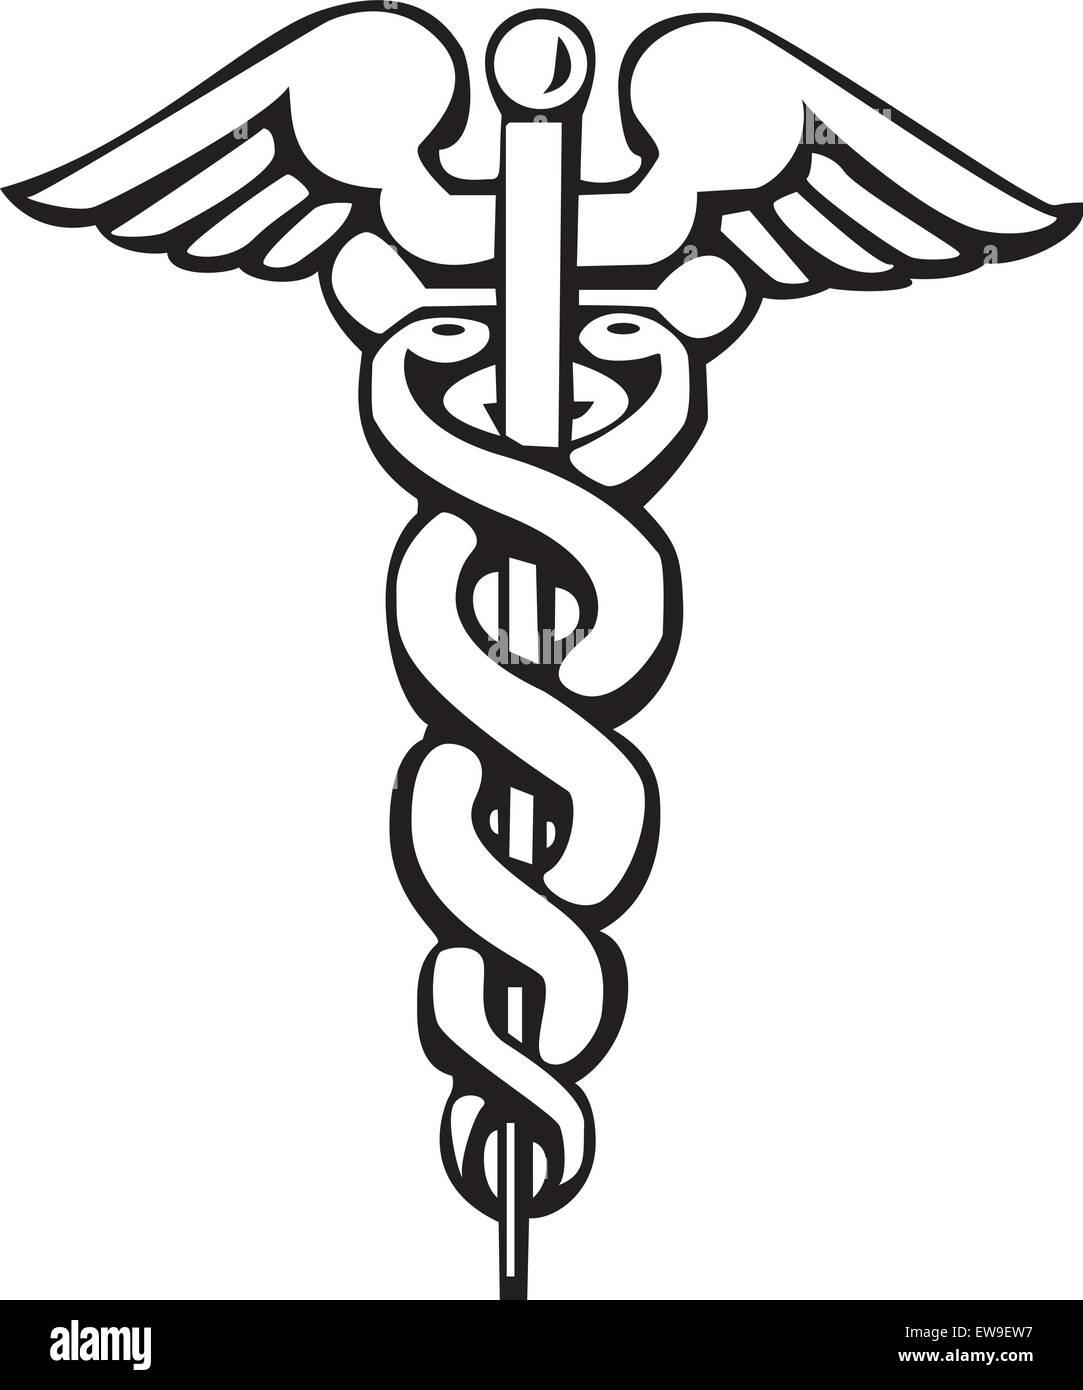 caduceus greek sign or symbol stock vector art illustration rh alamy com